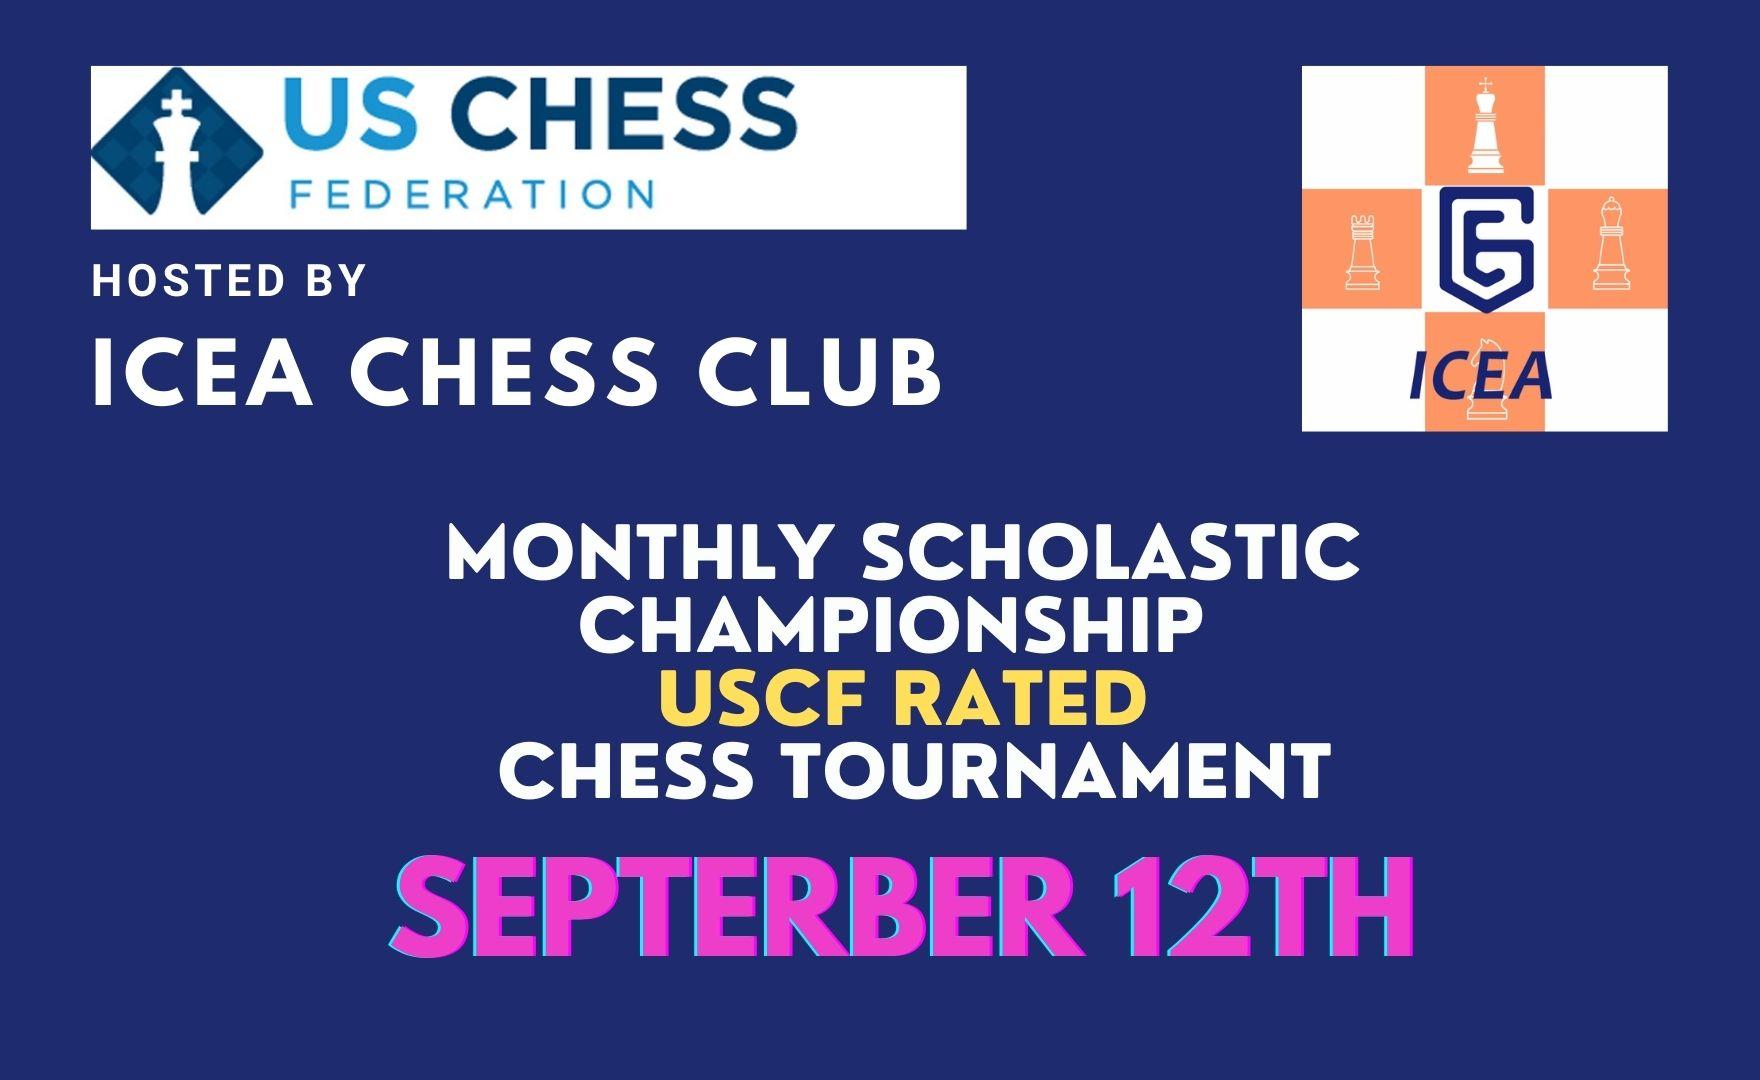 ICEA September Scholastic Championship Chess Tournament